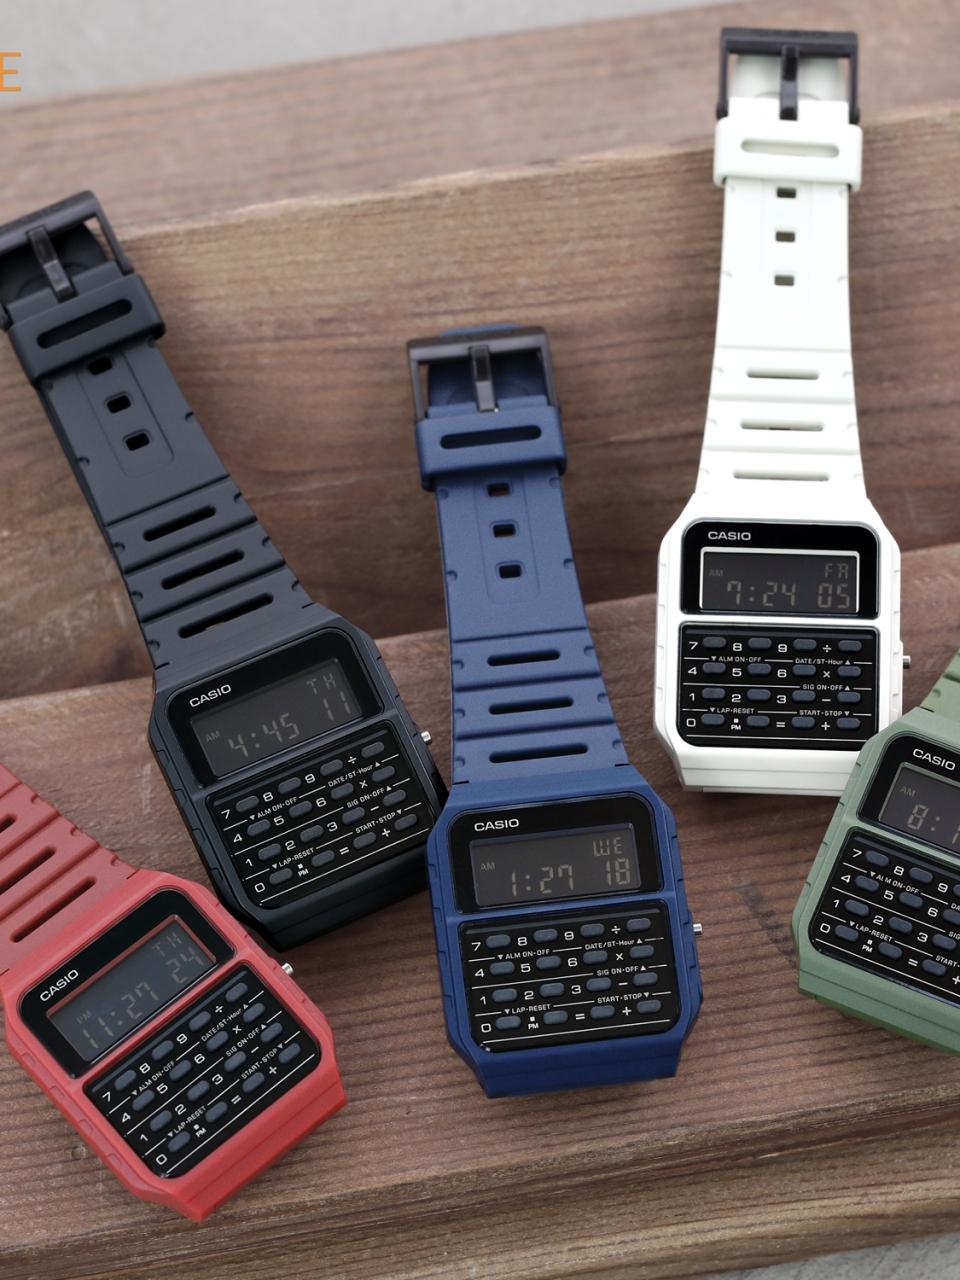 w_casio-calculator-watch-group-strapcode-watch-bands.jpg